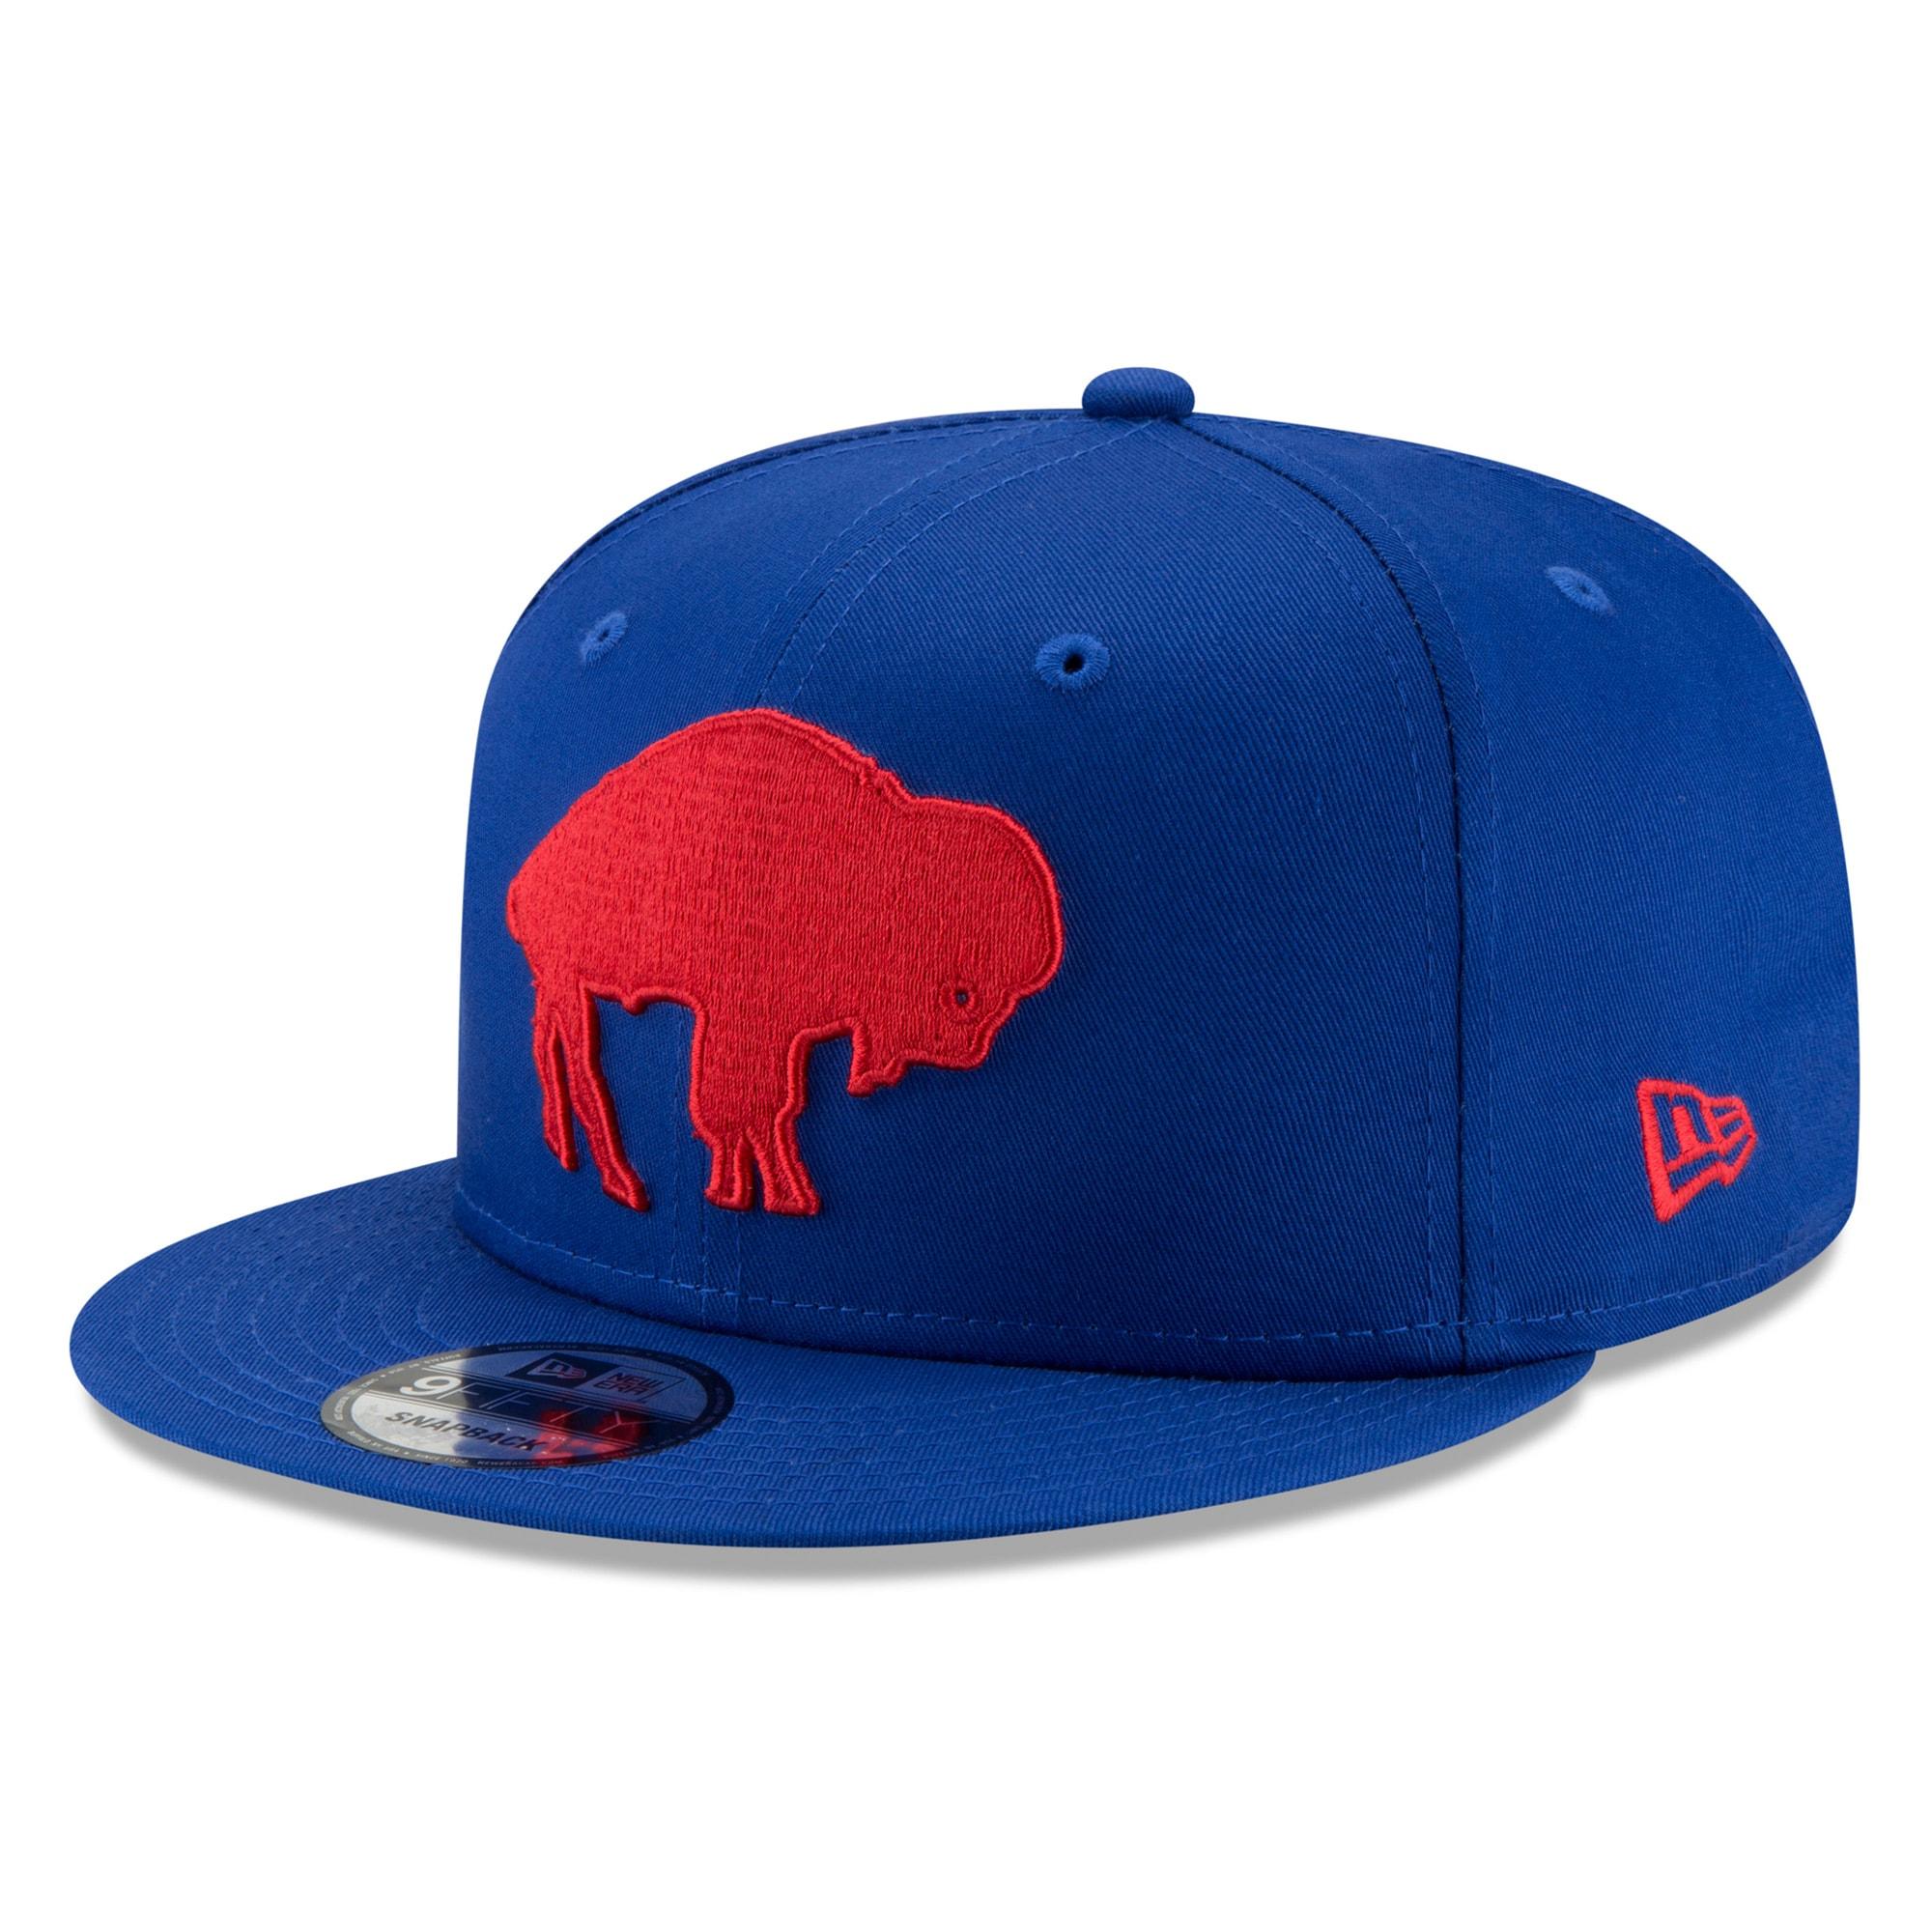 Buffalo Bills New Era Throwback 9FIFTY Adjustable Snapback Hat - Royal